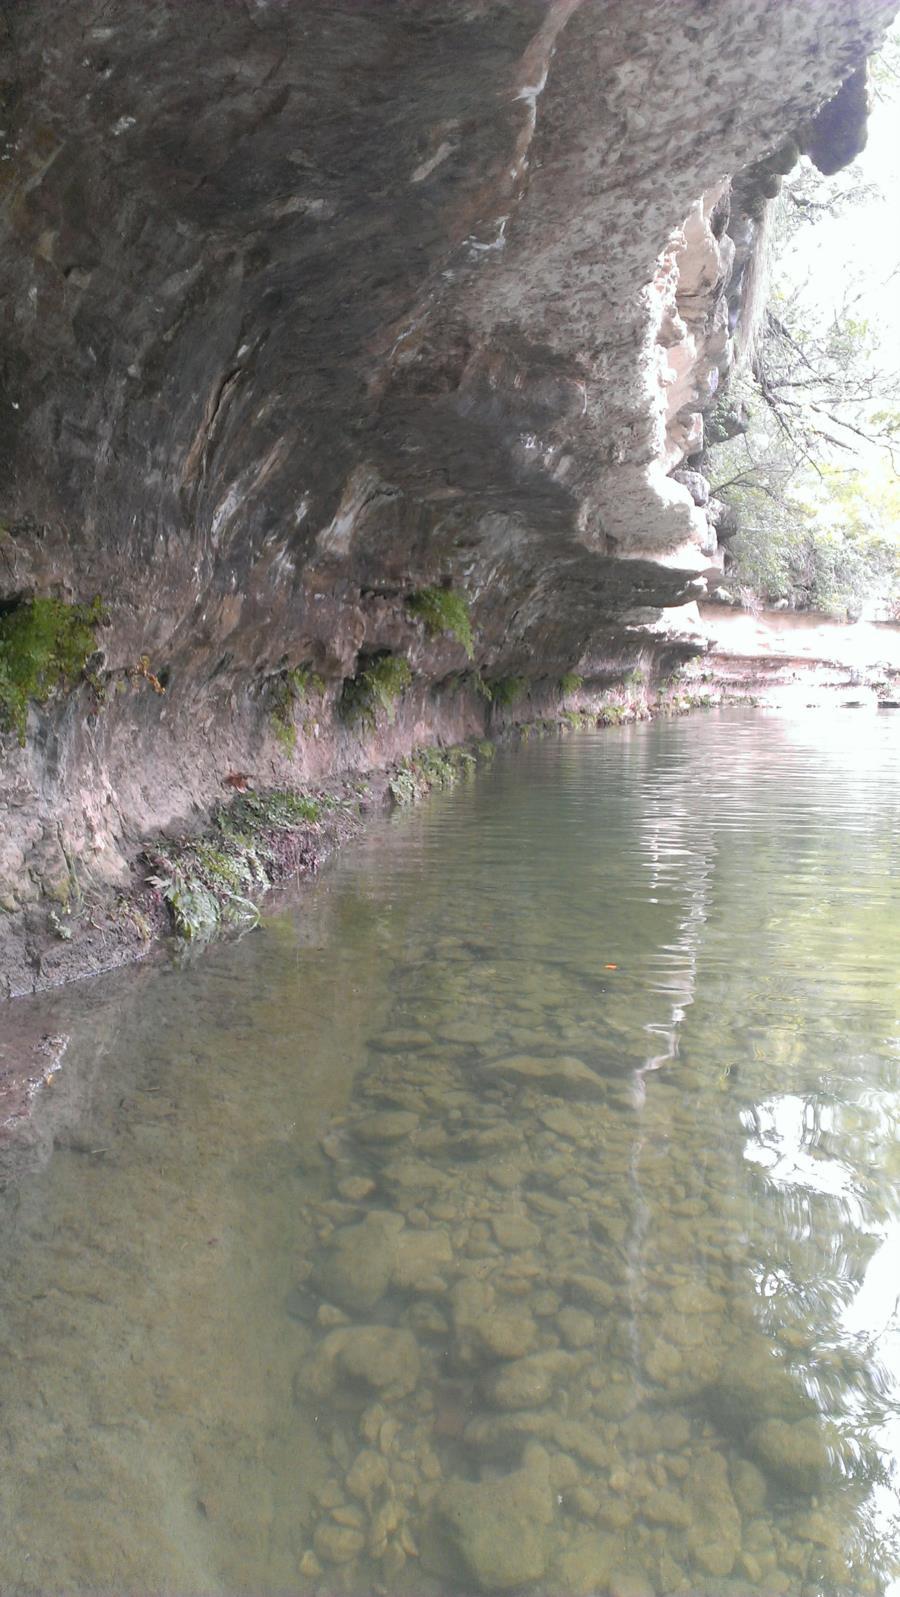 St. Edwards Park - Bull Creek Swimming Hole - Water near cliffs